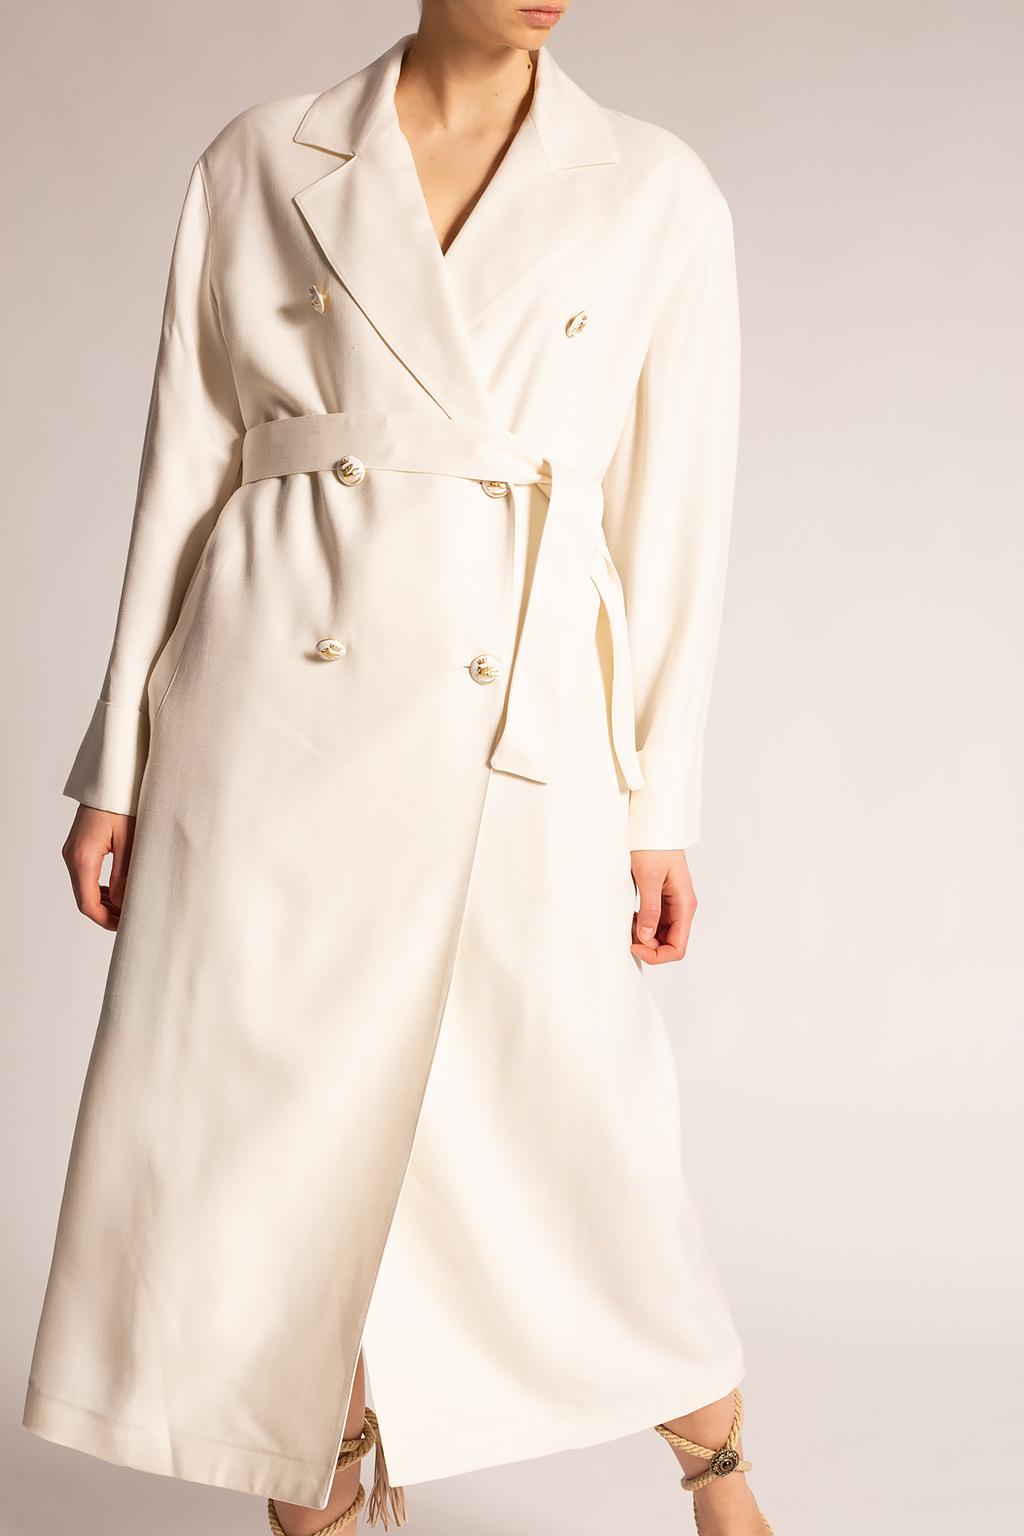 Etro Double-breasted coat